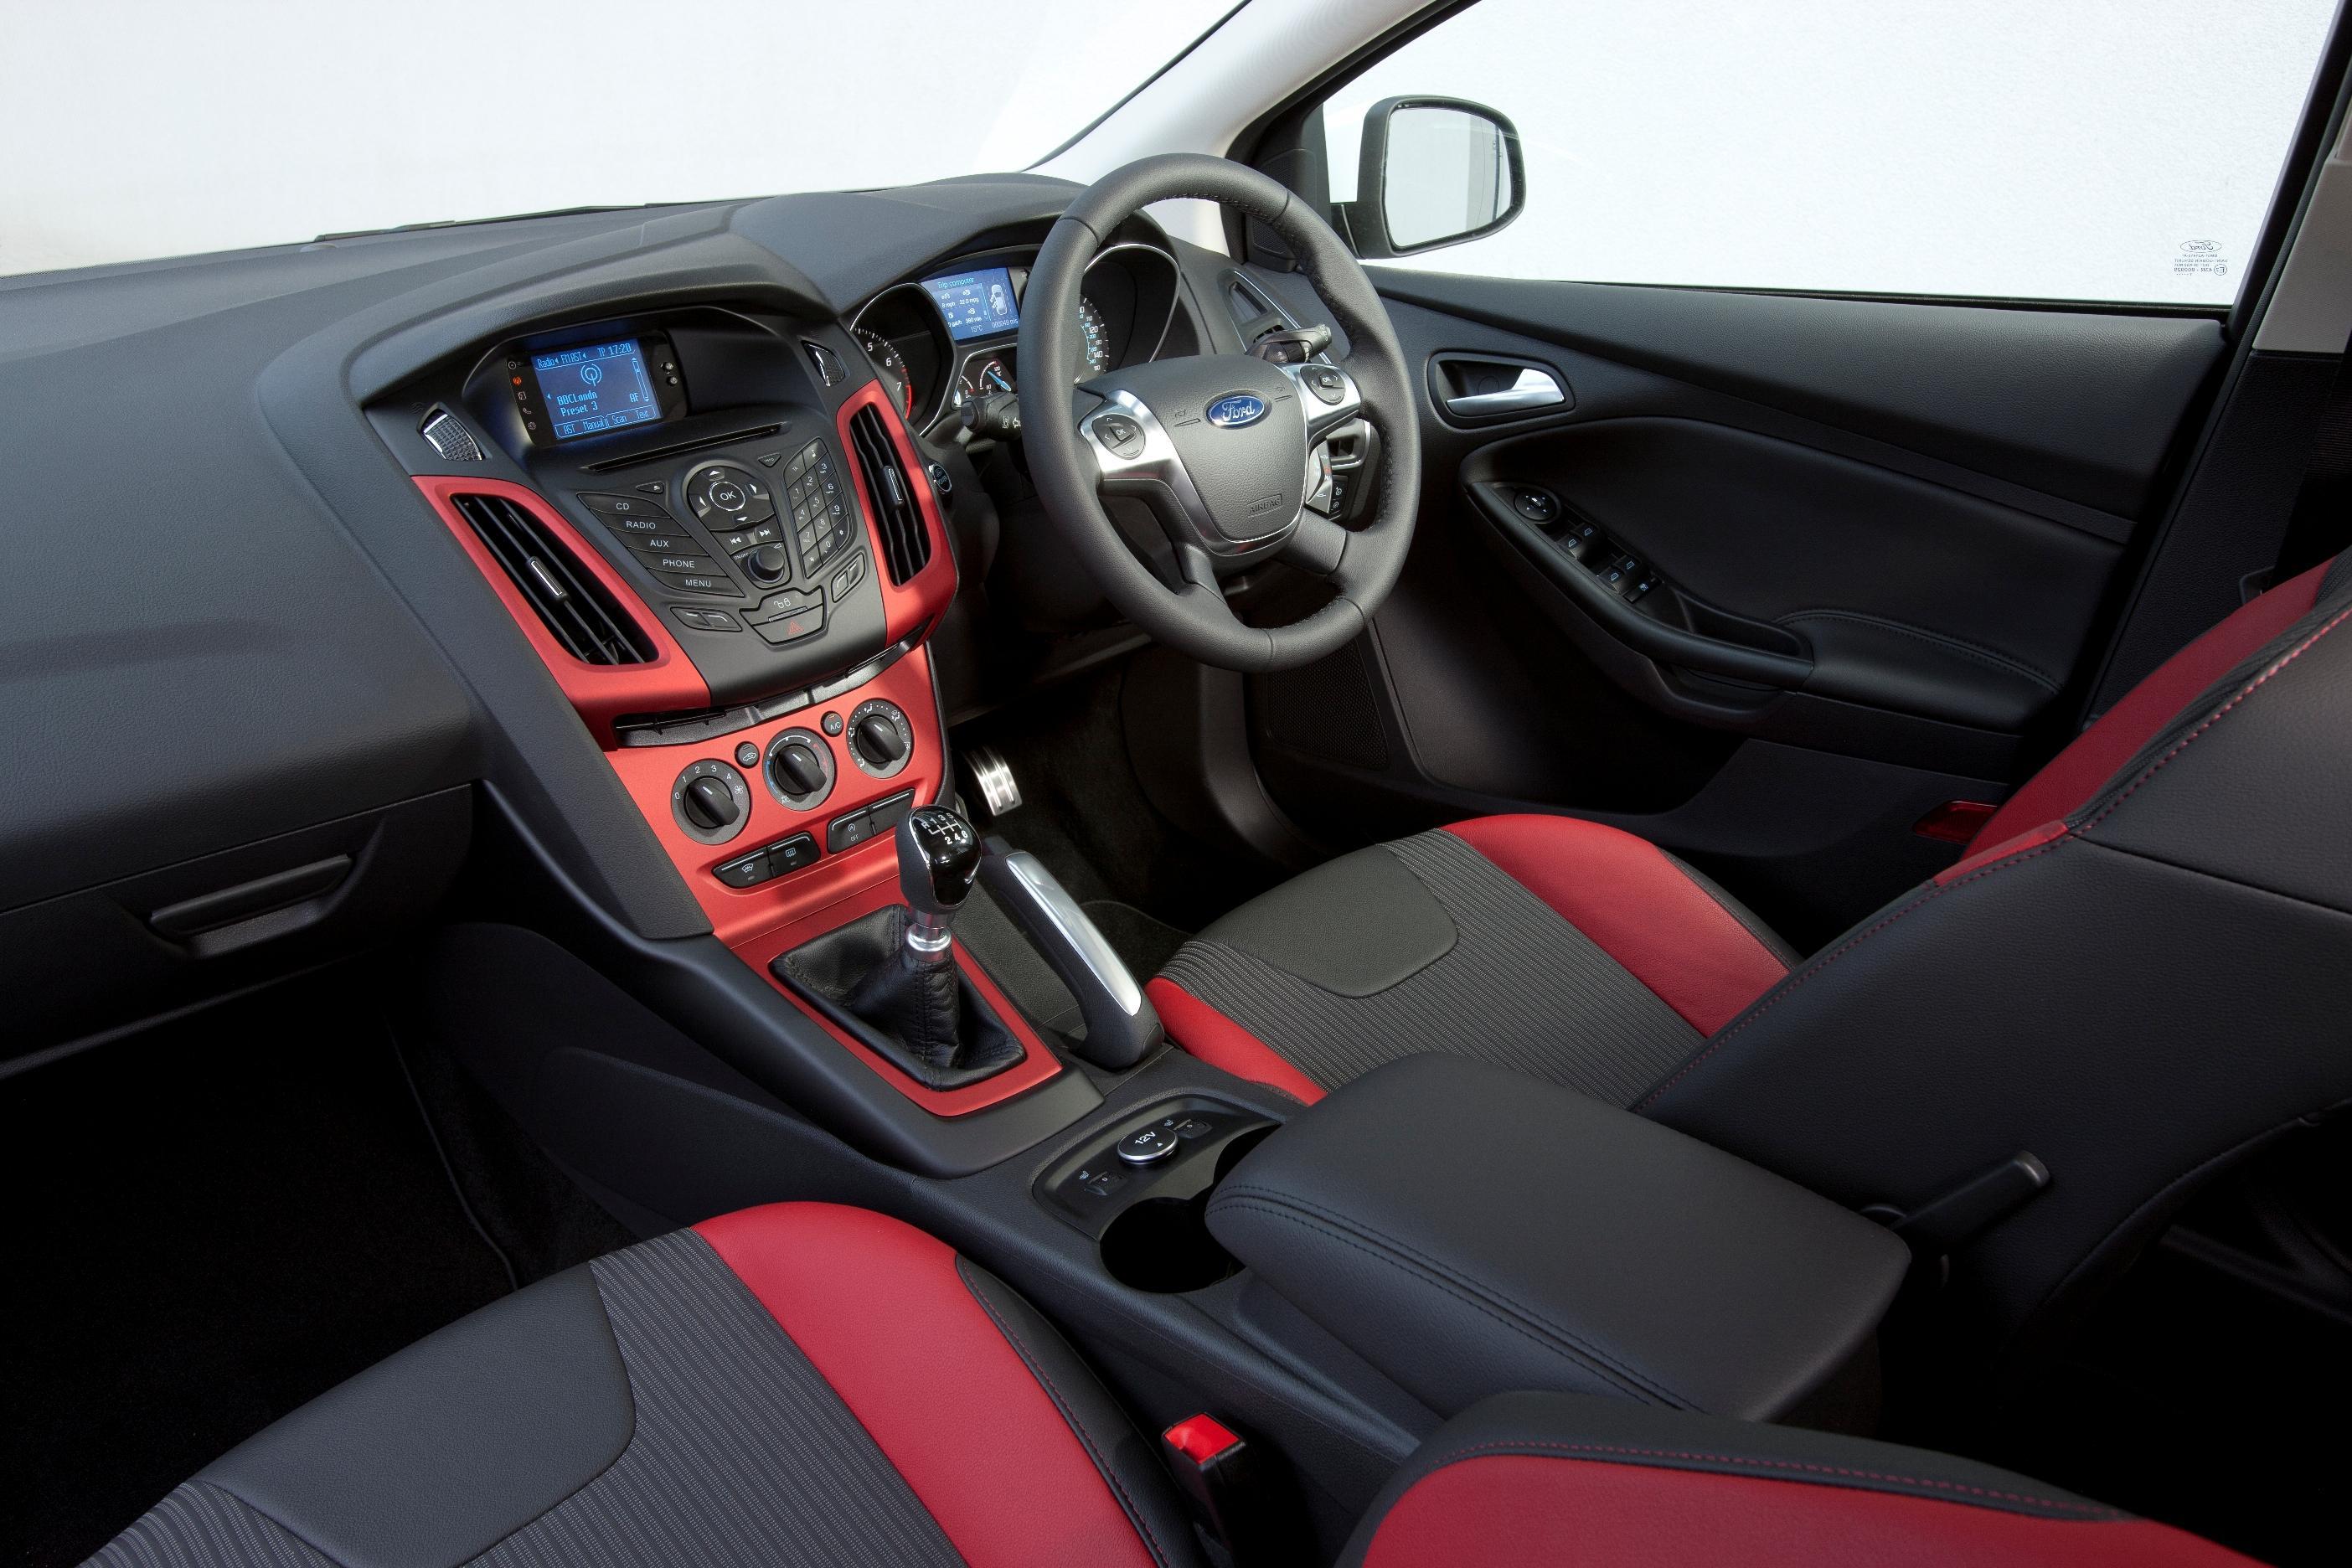 2012 Ford Focus Titanium Manual Transmission Daily Instruction 2014 Diagram Zetec S Price 18 745 Rh Automobilesreview Com Interior